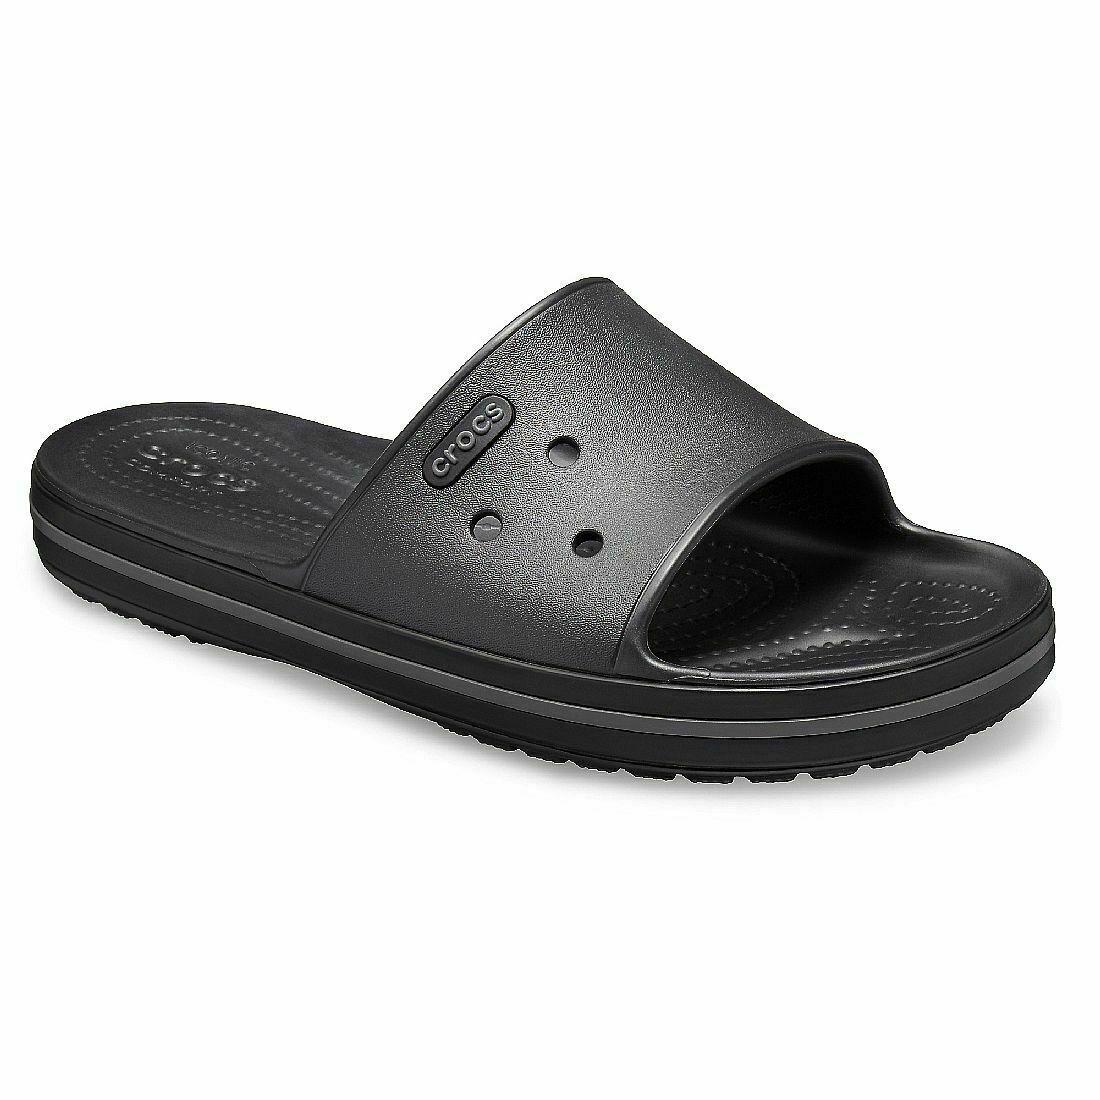 Crocs Crocband III Adults M8/W9 EUR 42-43 270mm Black Graphite Slide Sandals